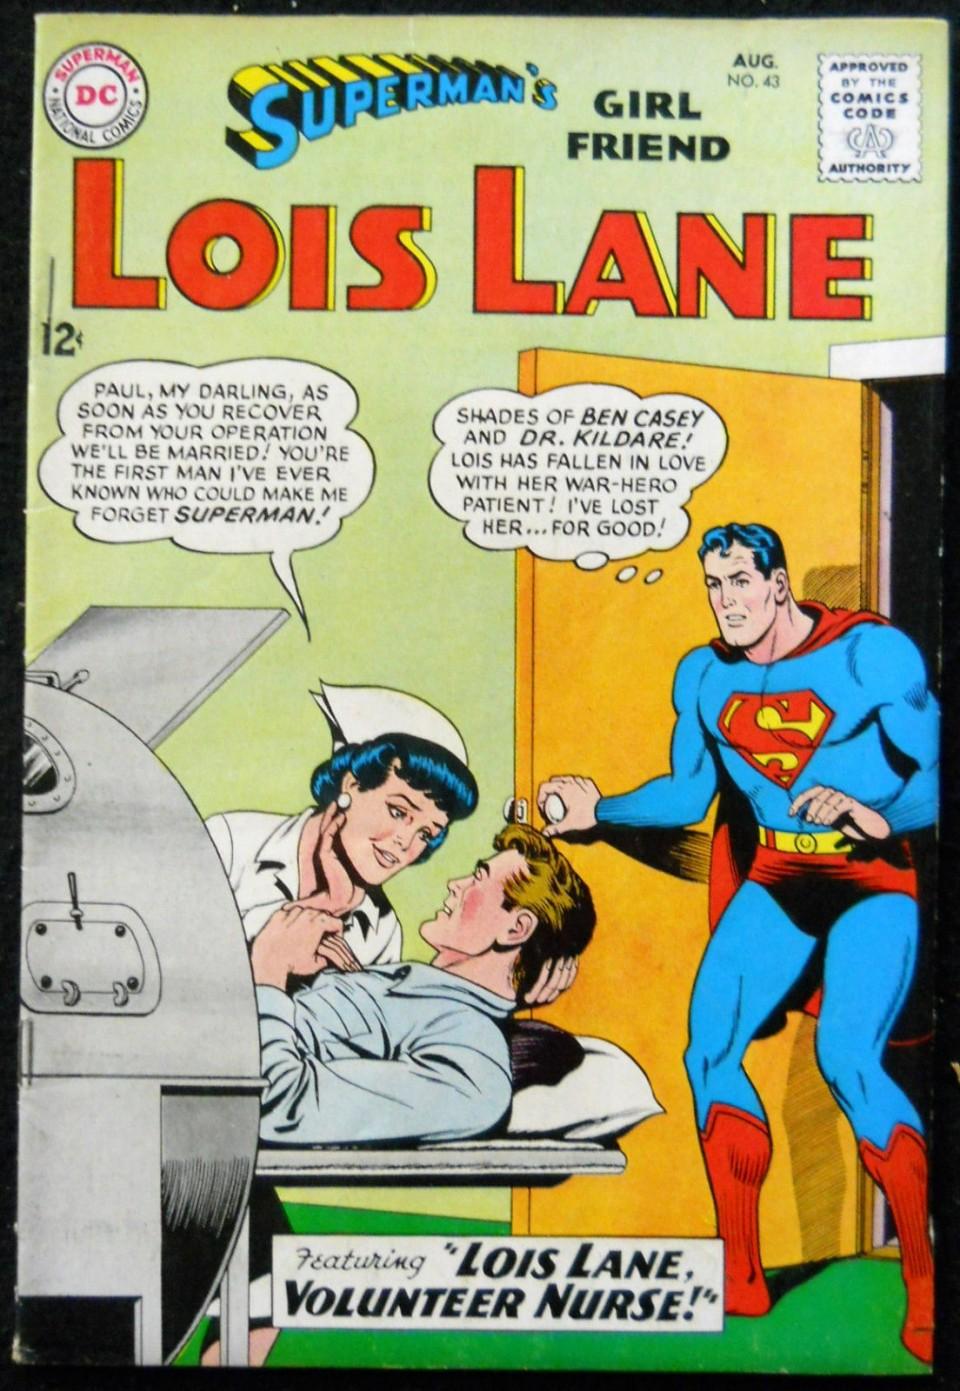 Supermans girlfriend lois lane 43 vg silver age comics supermans girlfriend lois lane 43 vg altavistaventures Choice Image